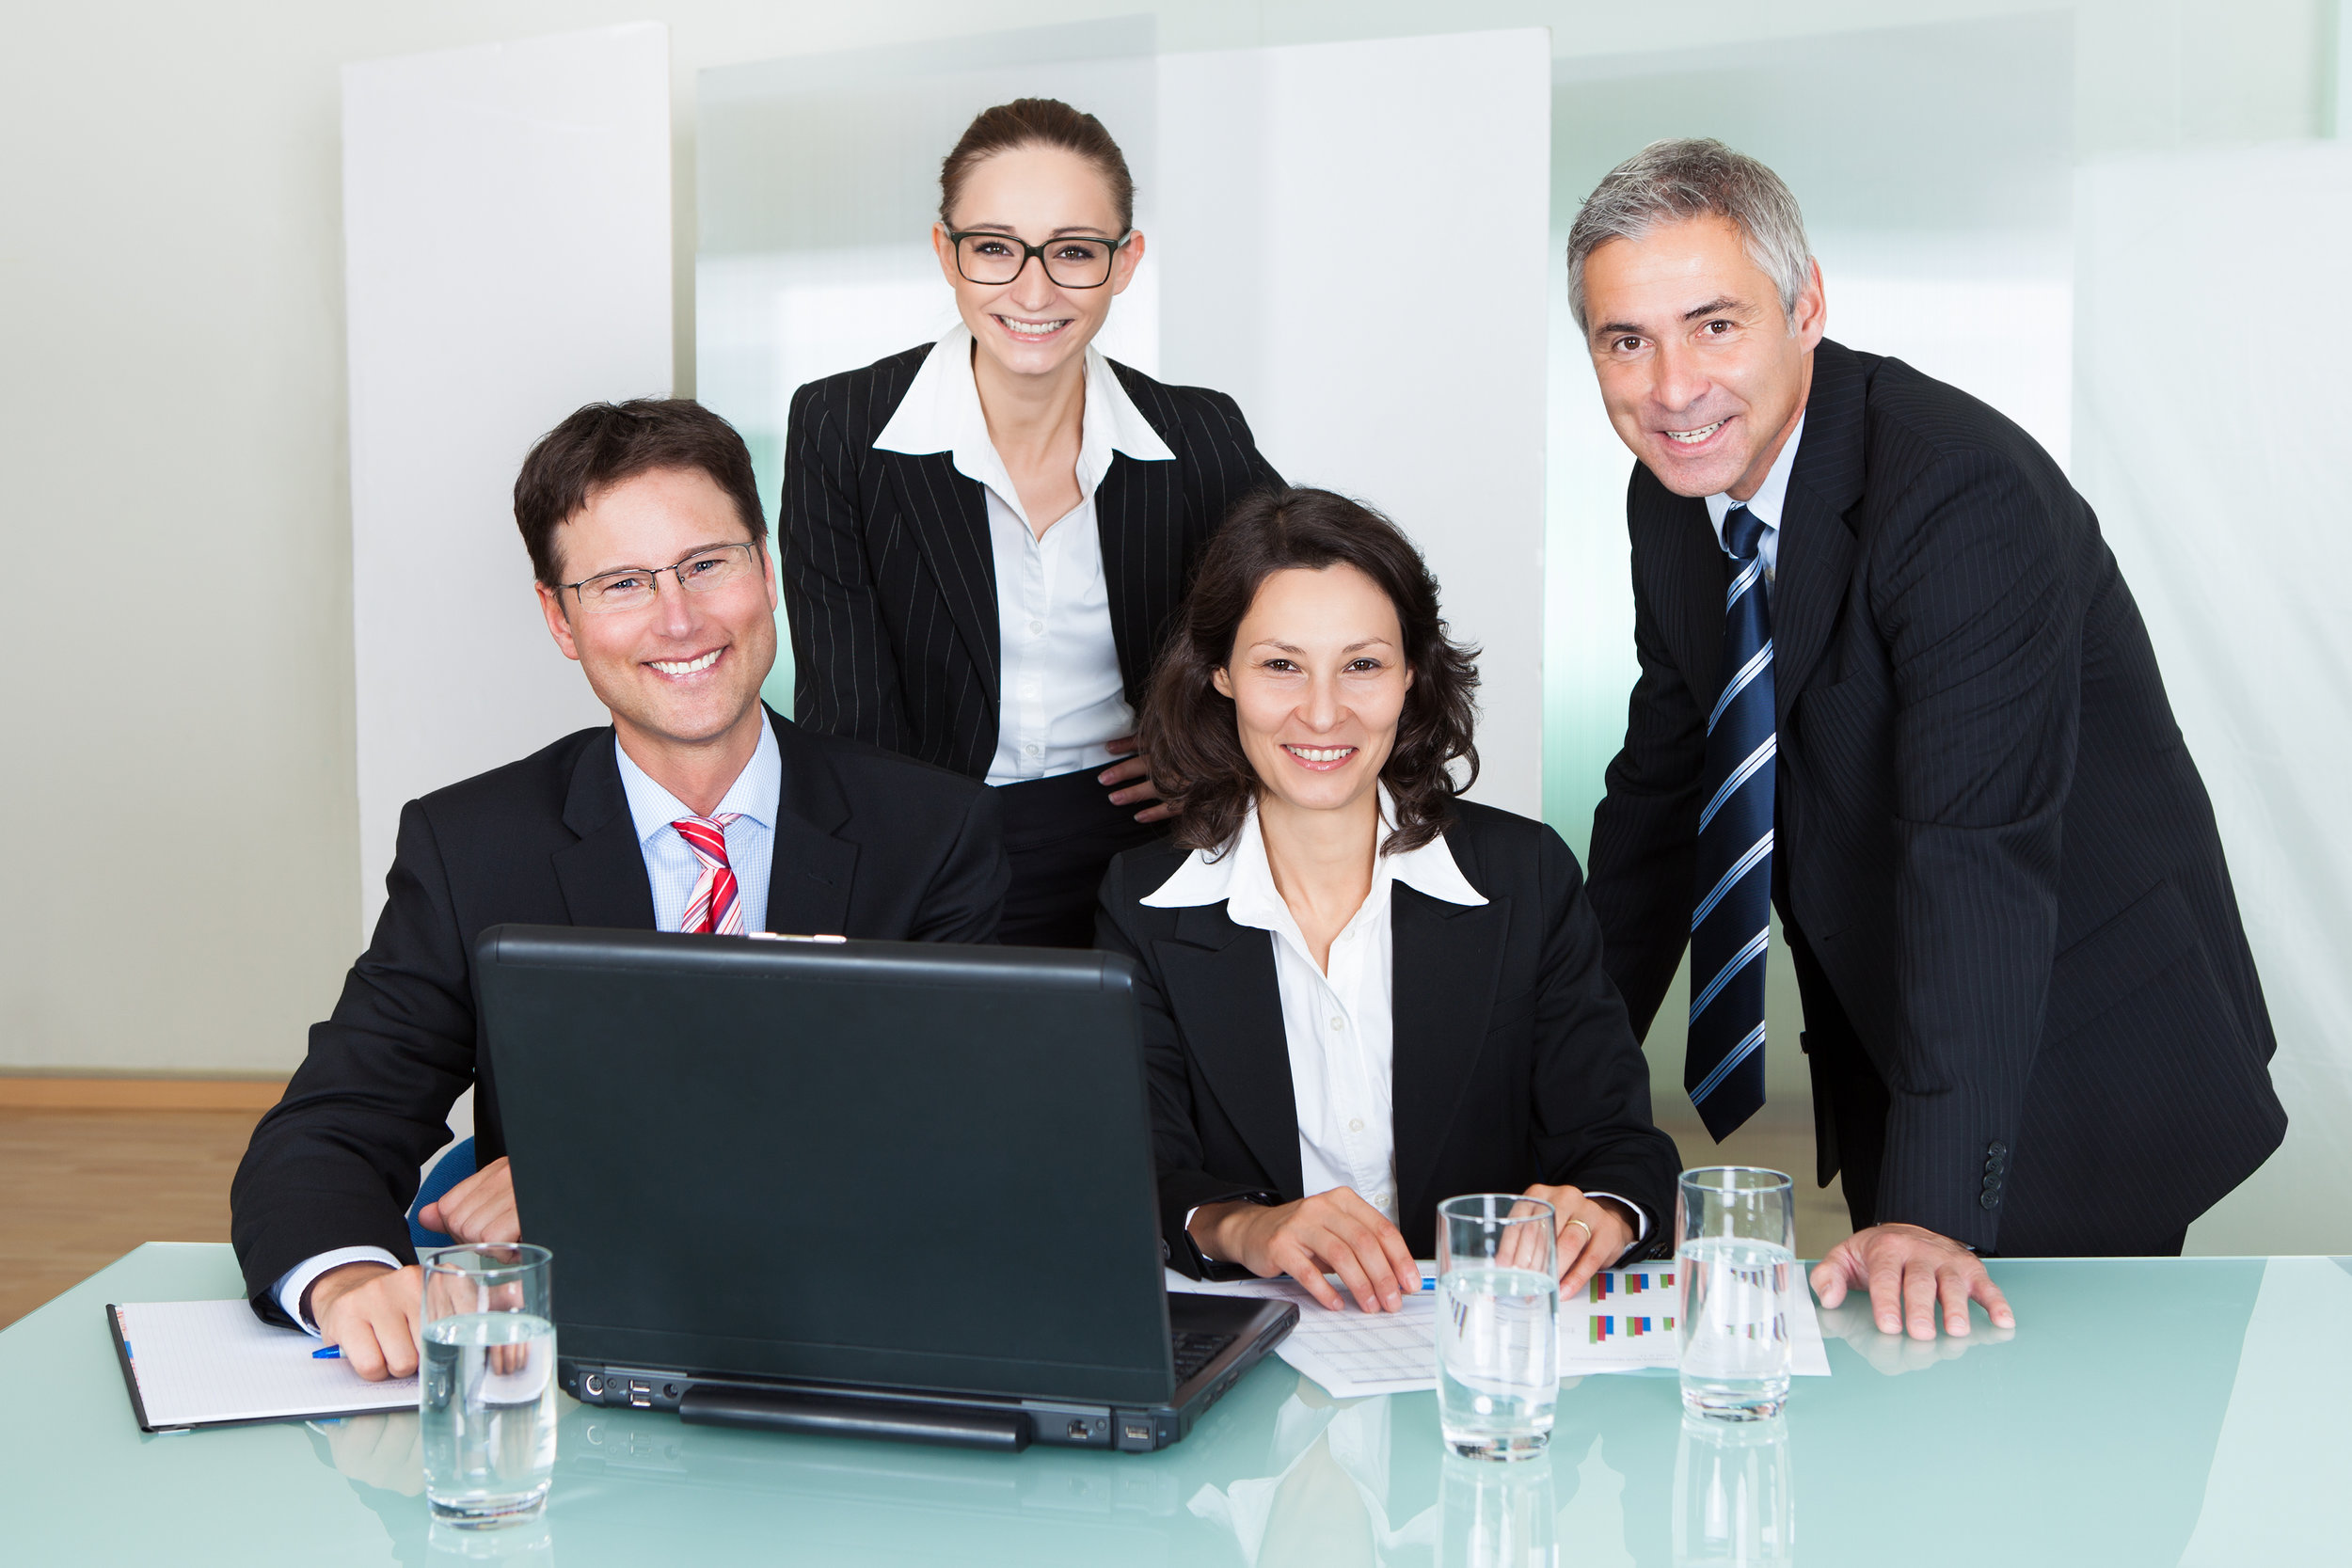 Contract_Marketing_Executives.jpeg